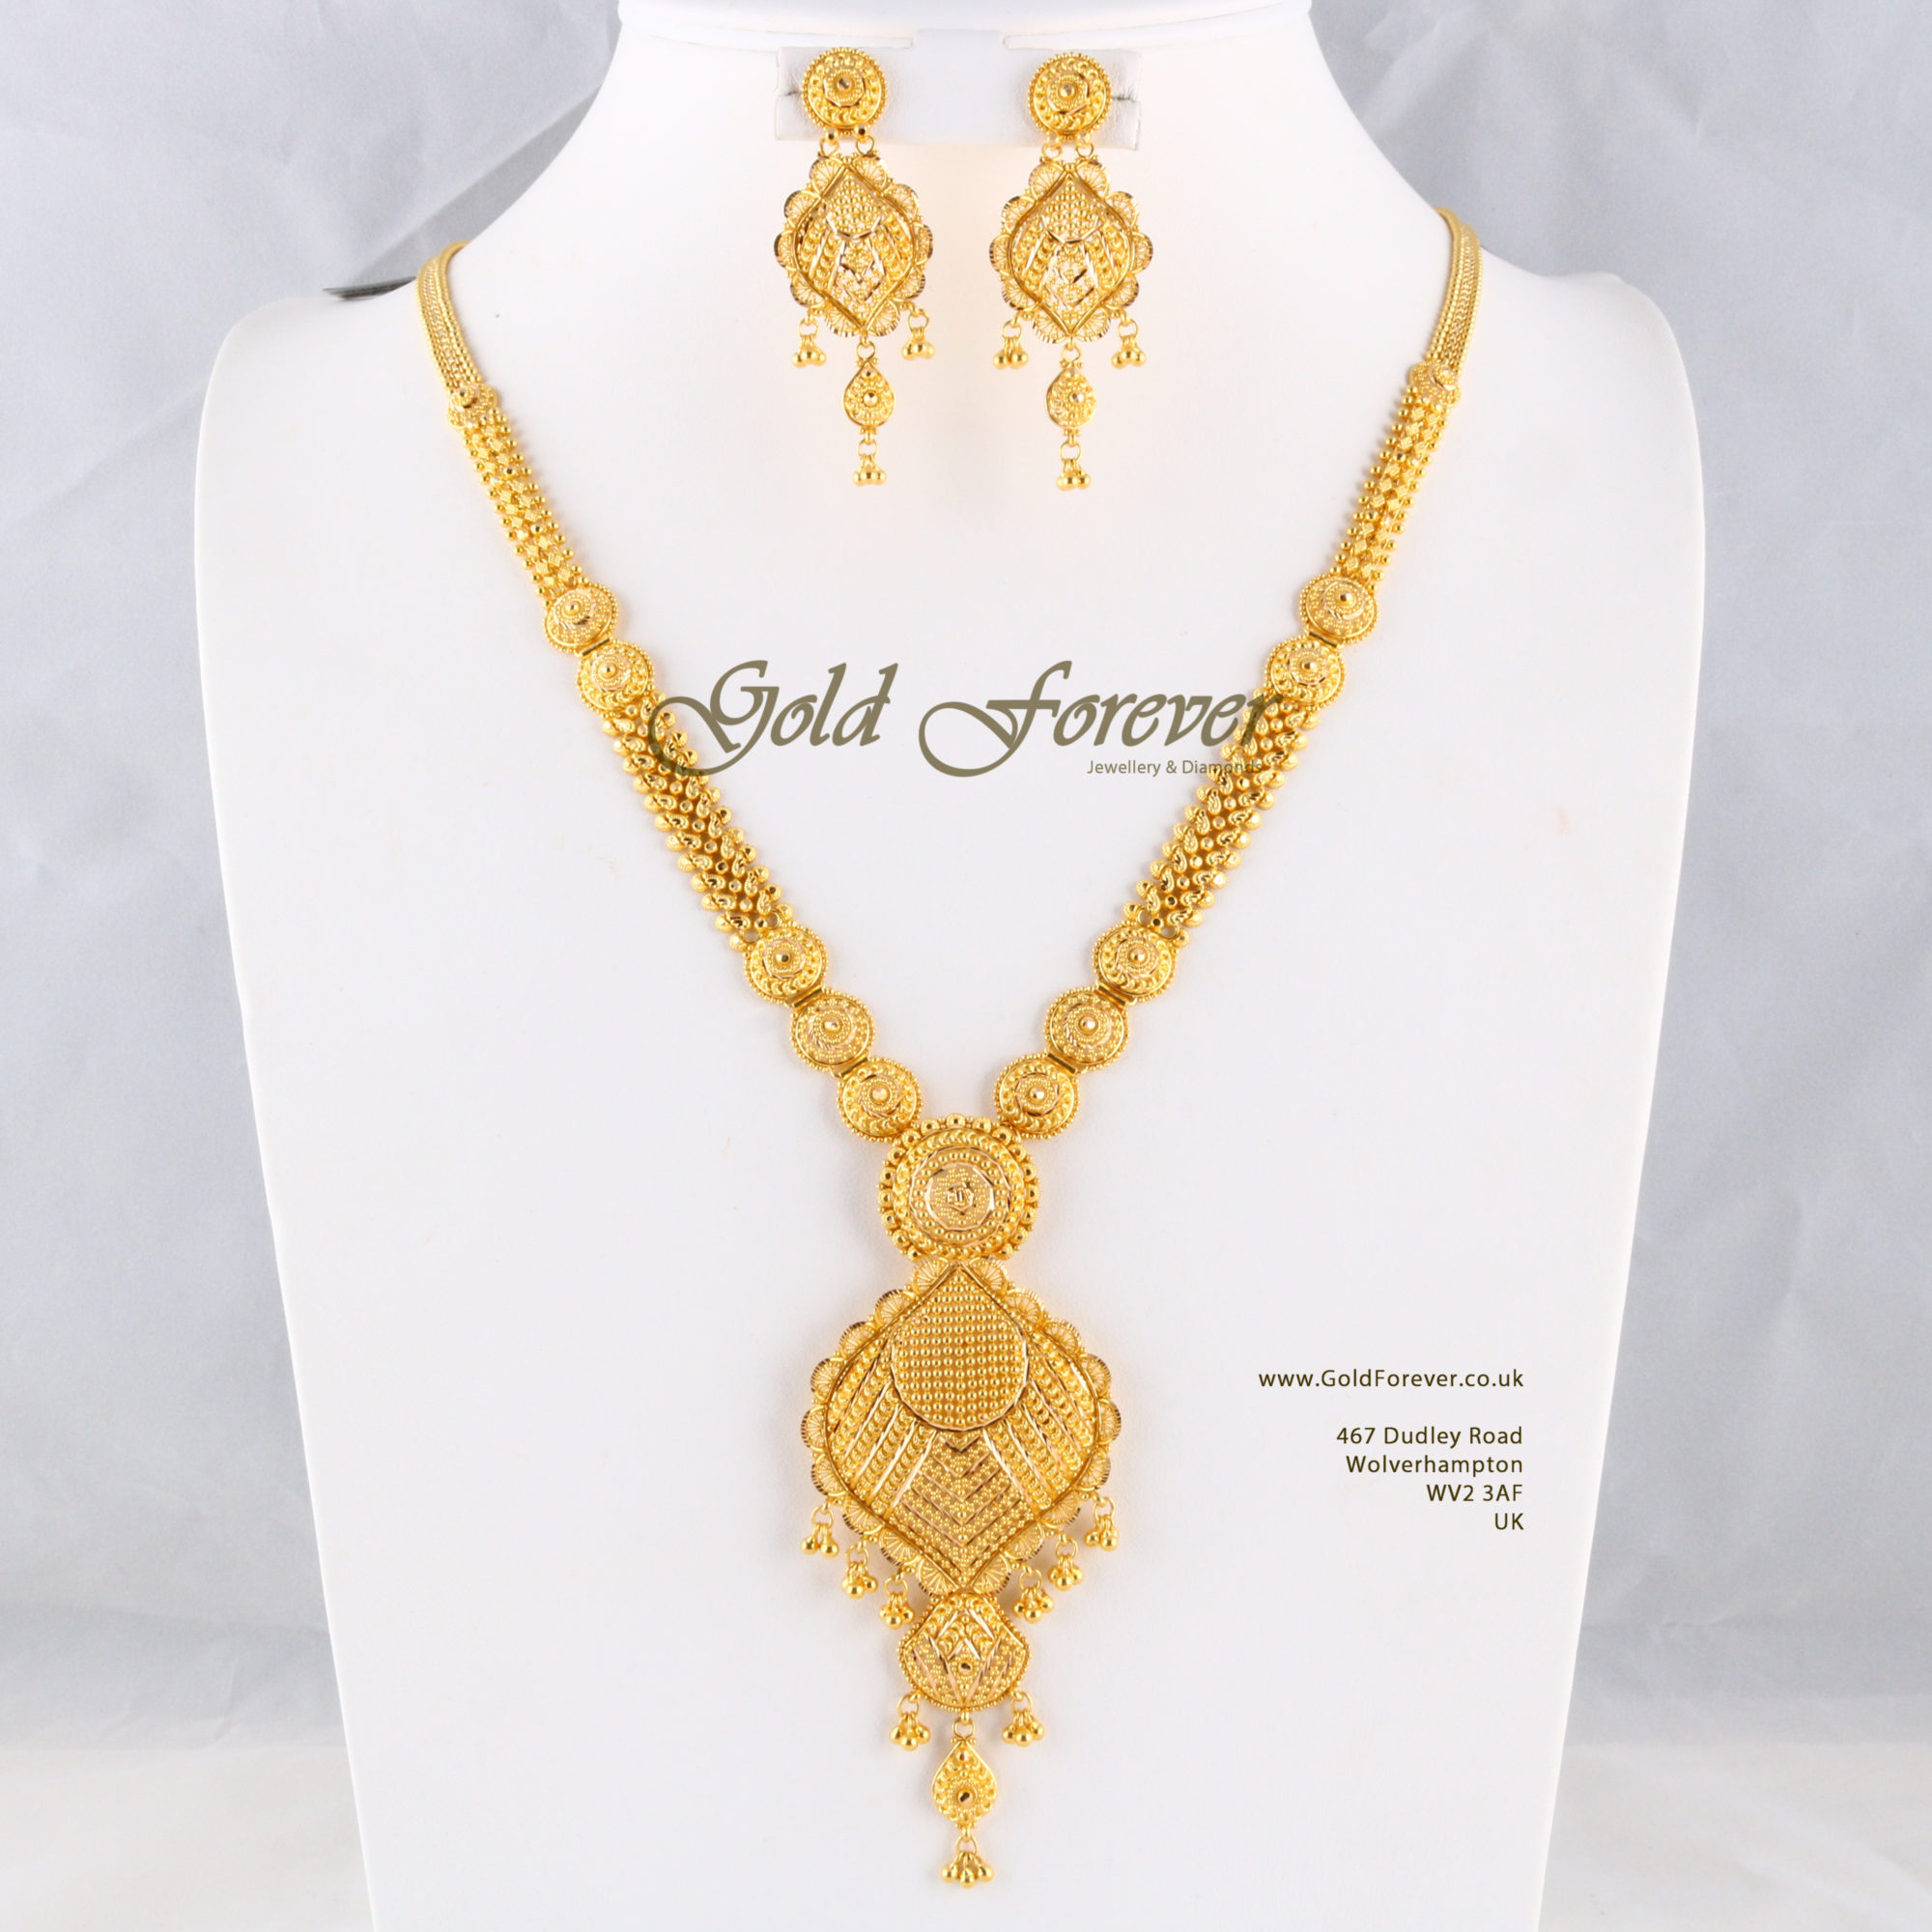 22 Carat Indian Gold Long Necklace 62 2 Grams Code Ls1118001